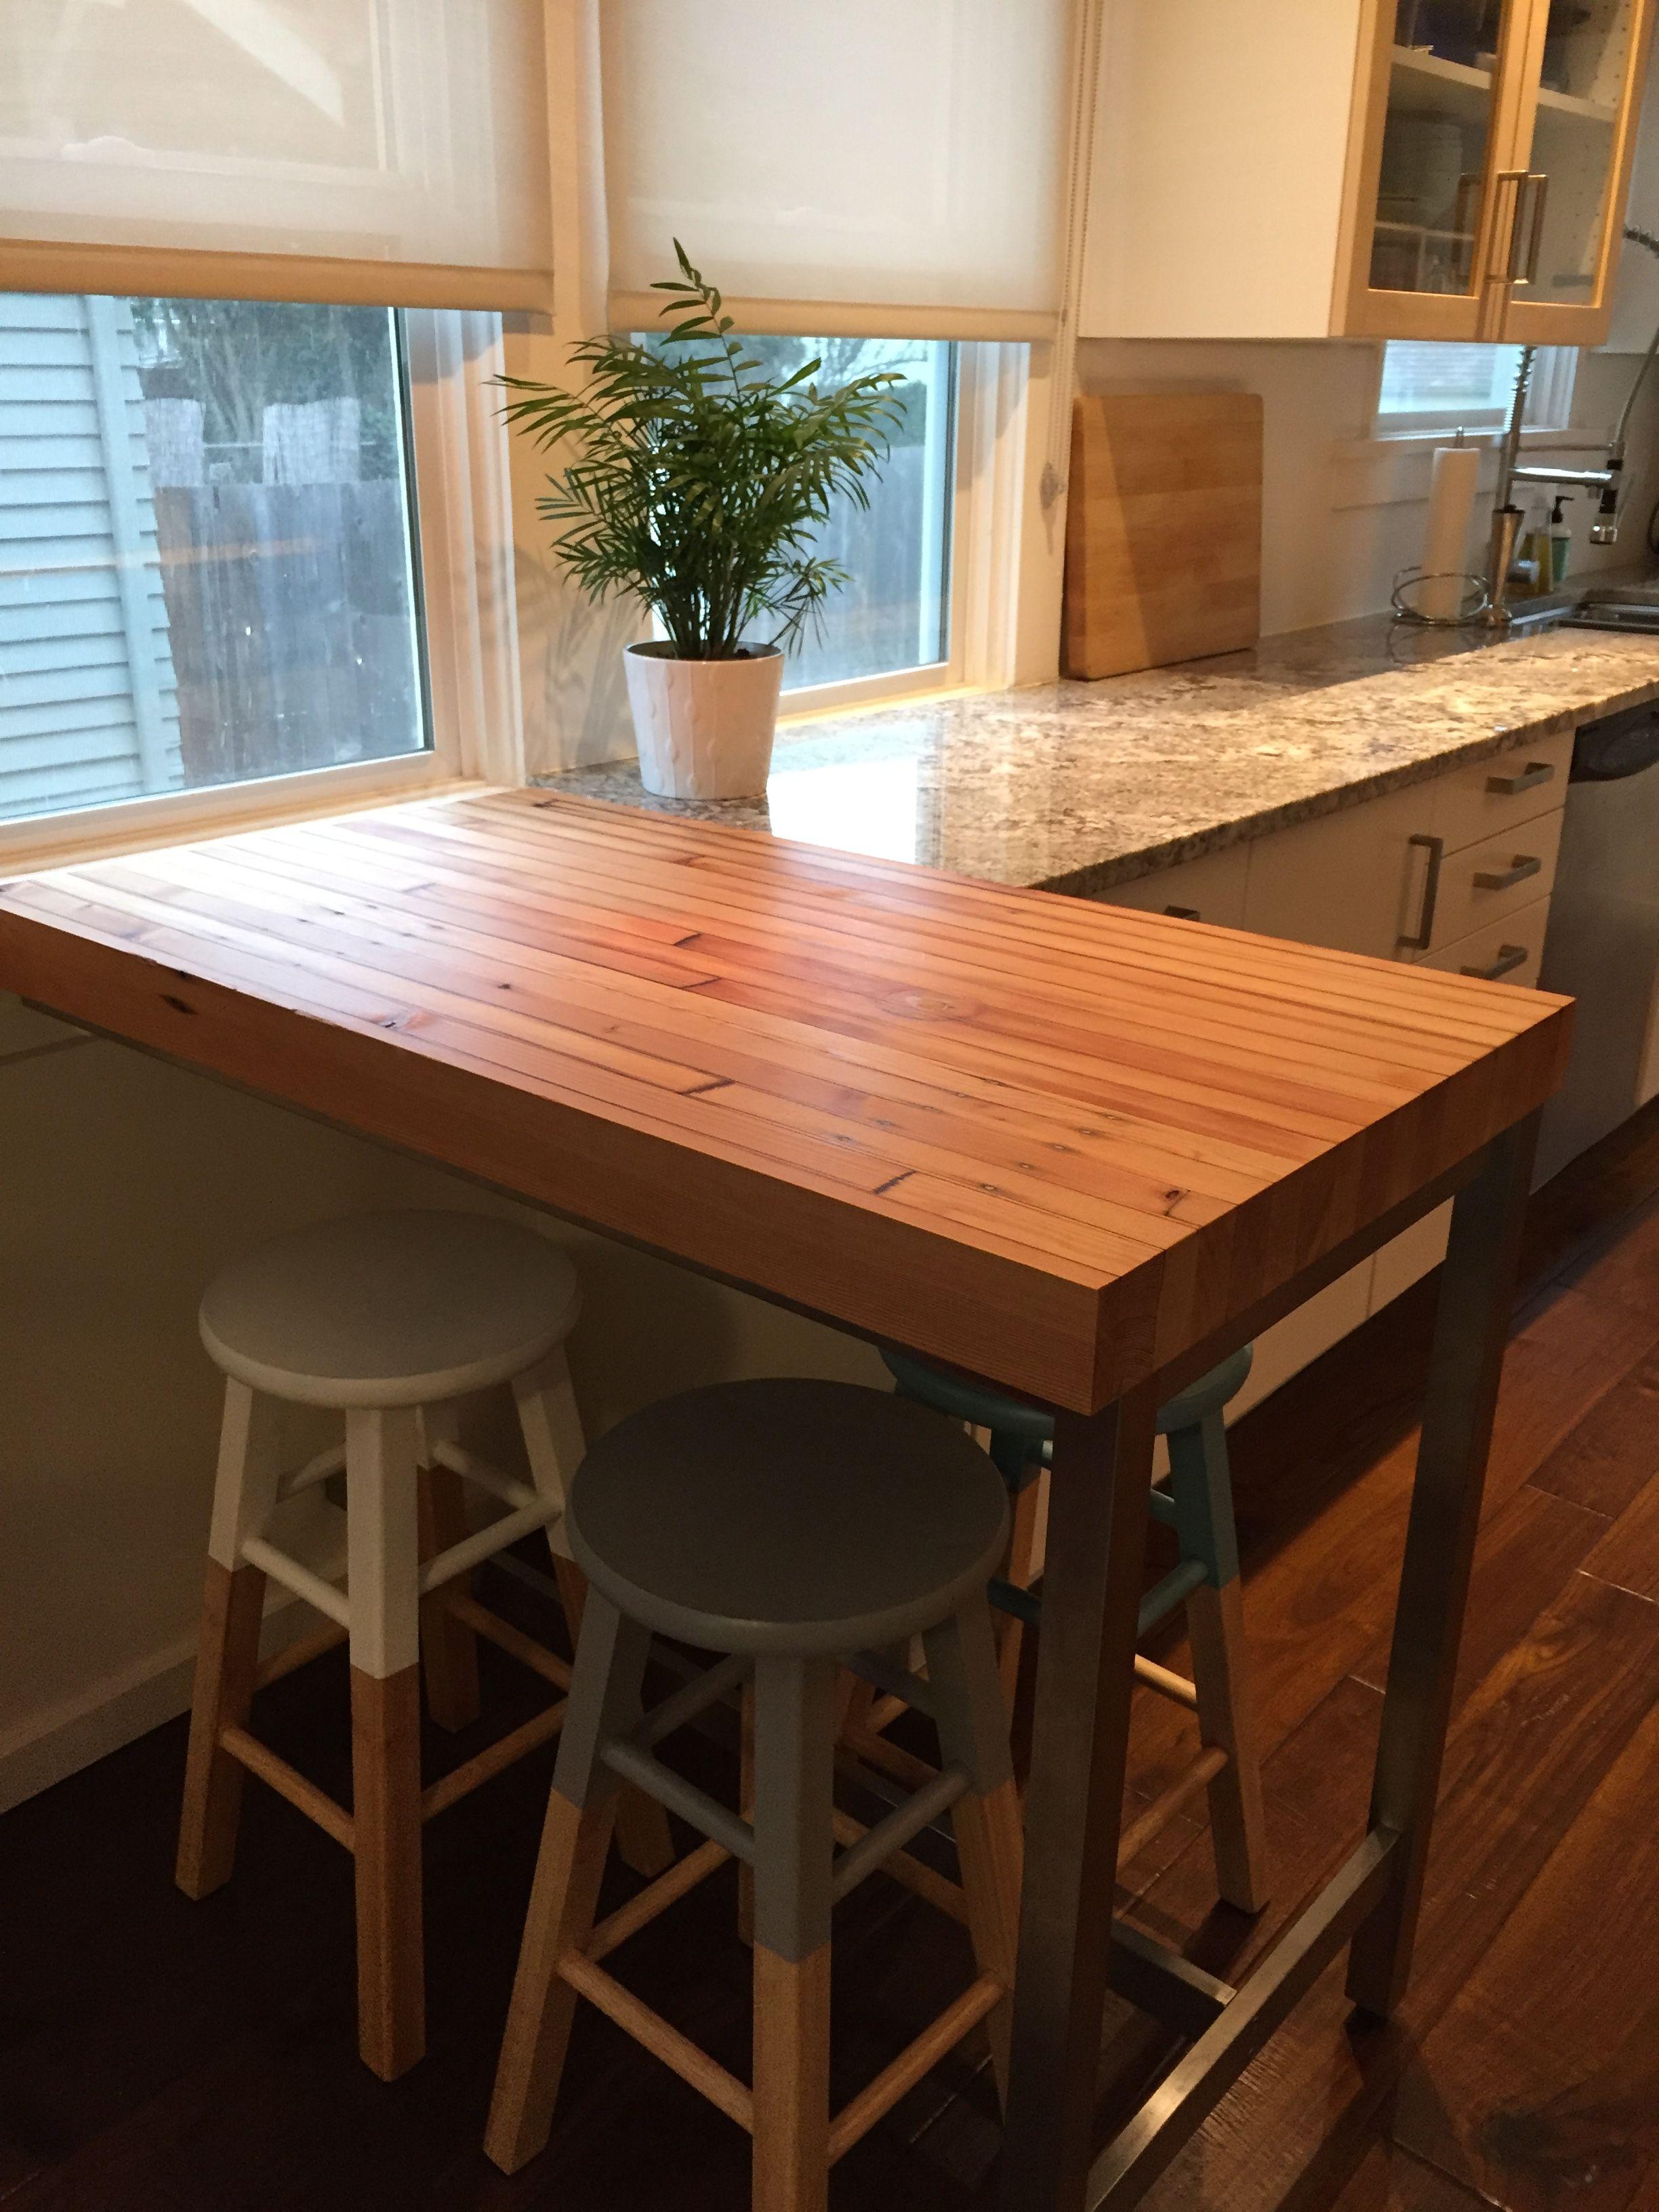 Pin By Salvage Works On Kitchen Remodel Kitchen Remodel Kitchen Design Custom Wood Furniture